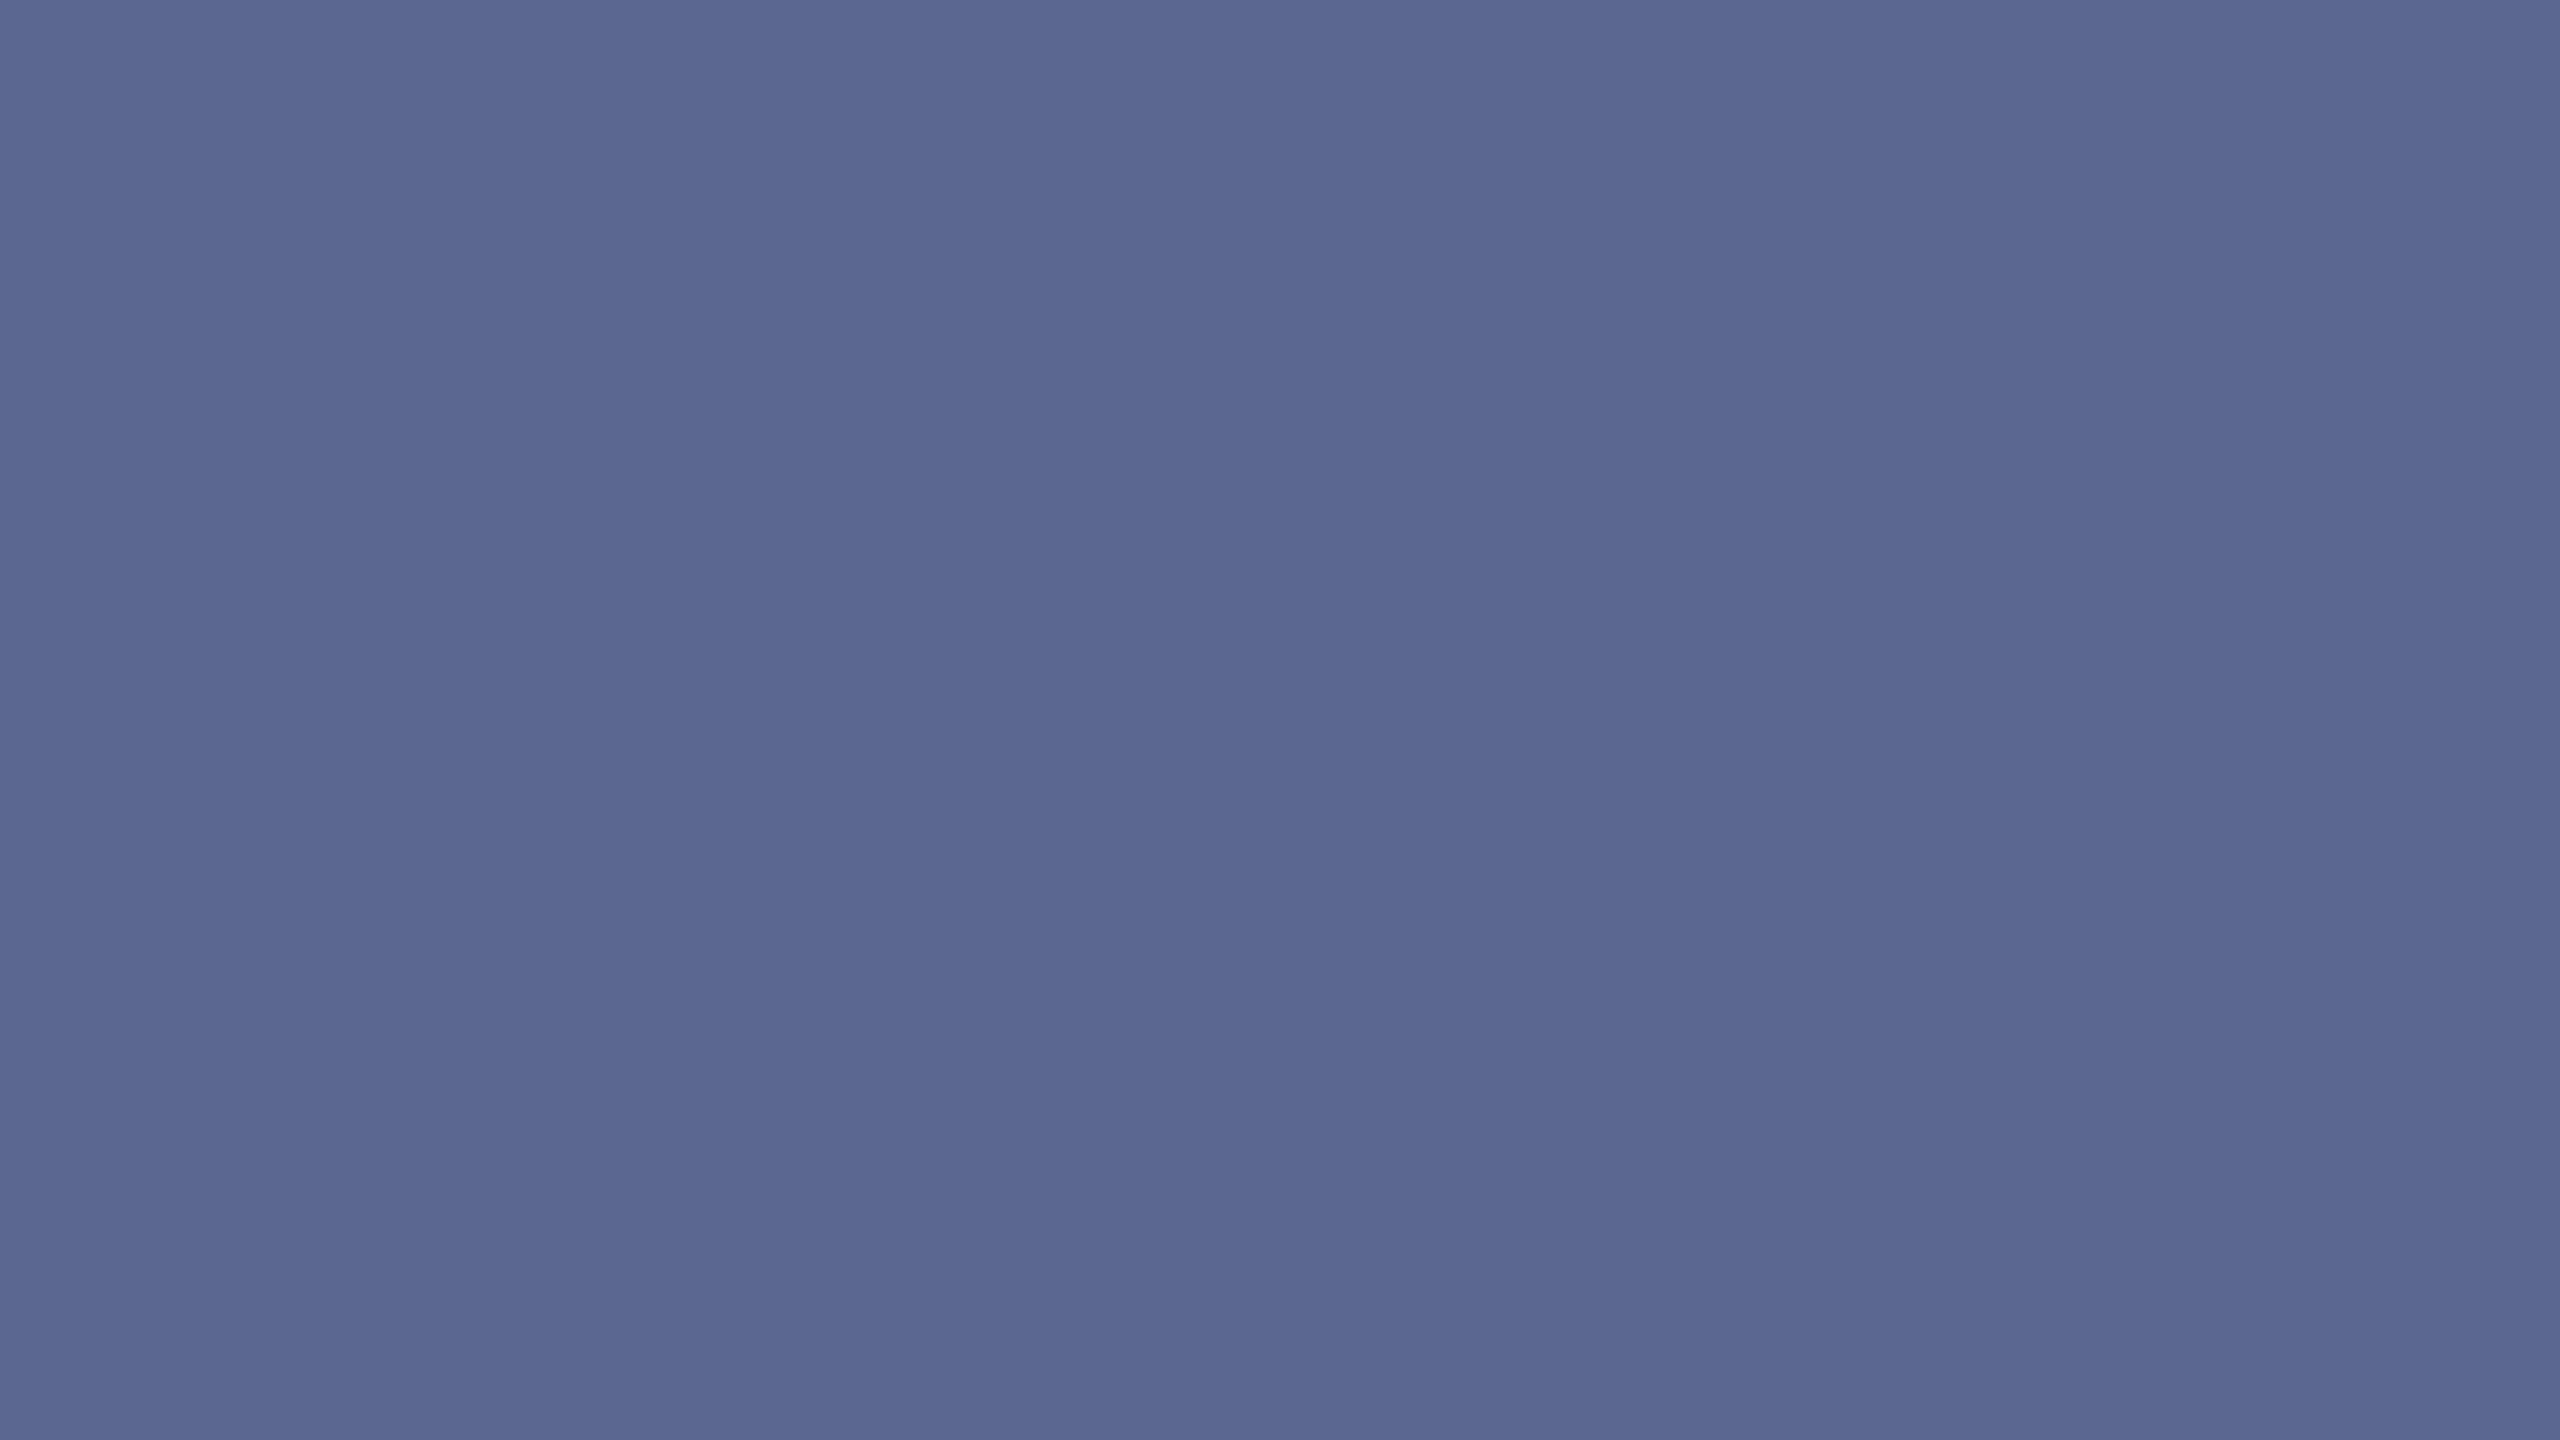 Purple_2560x1440px